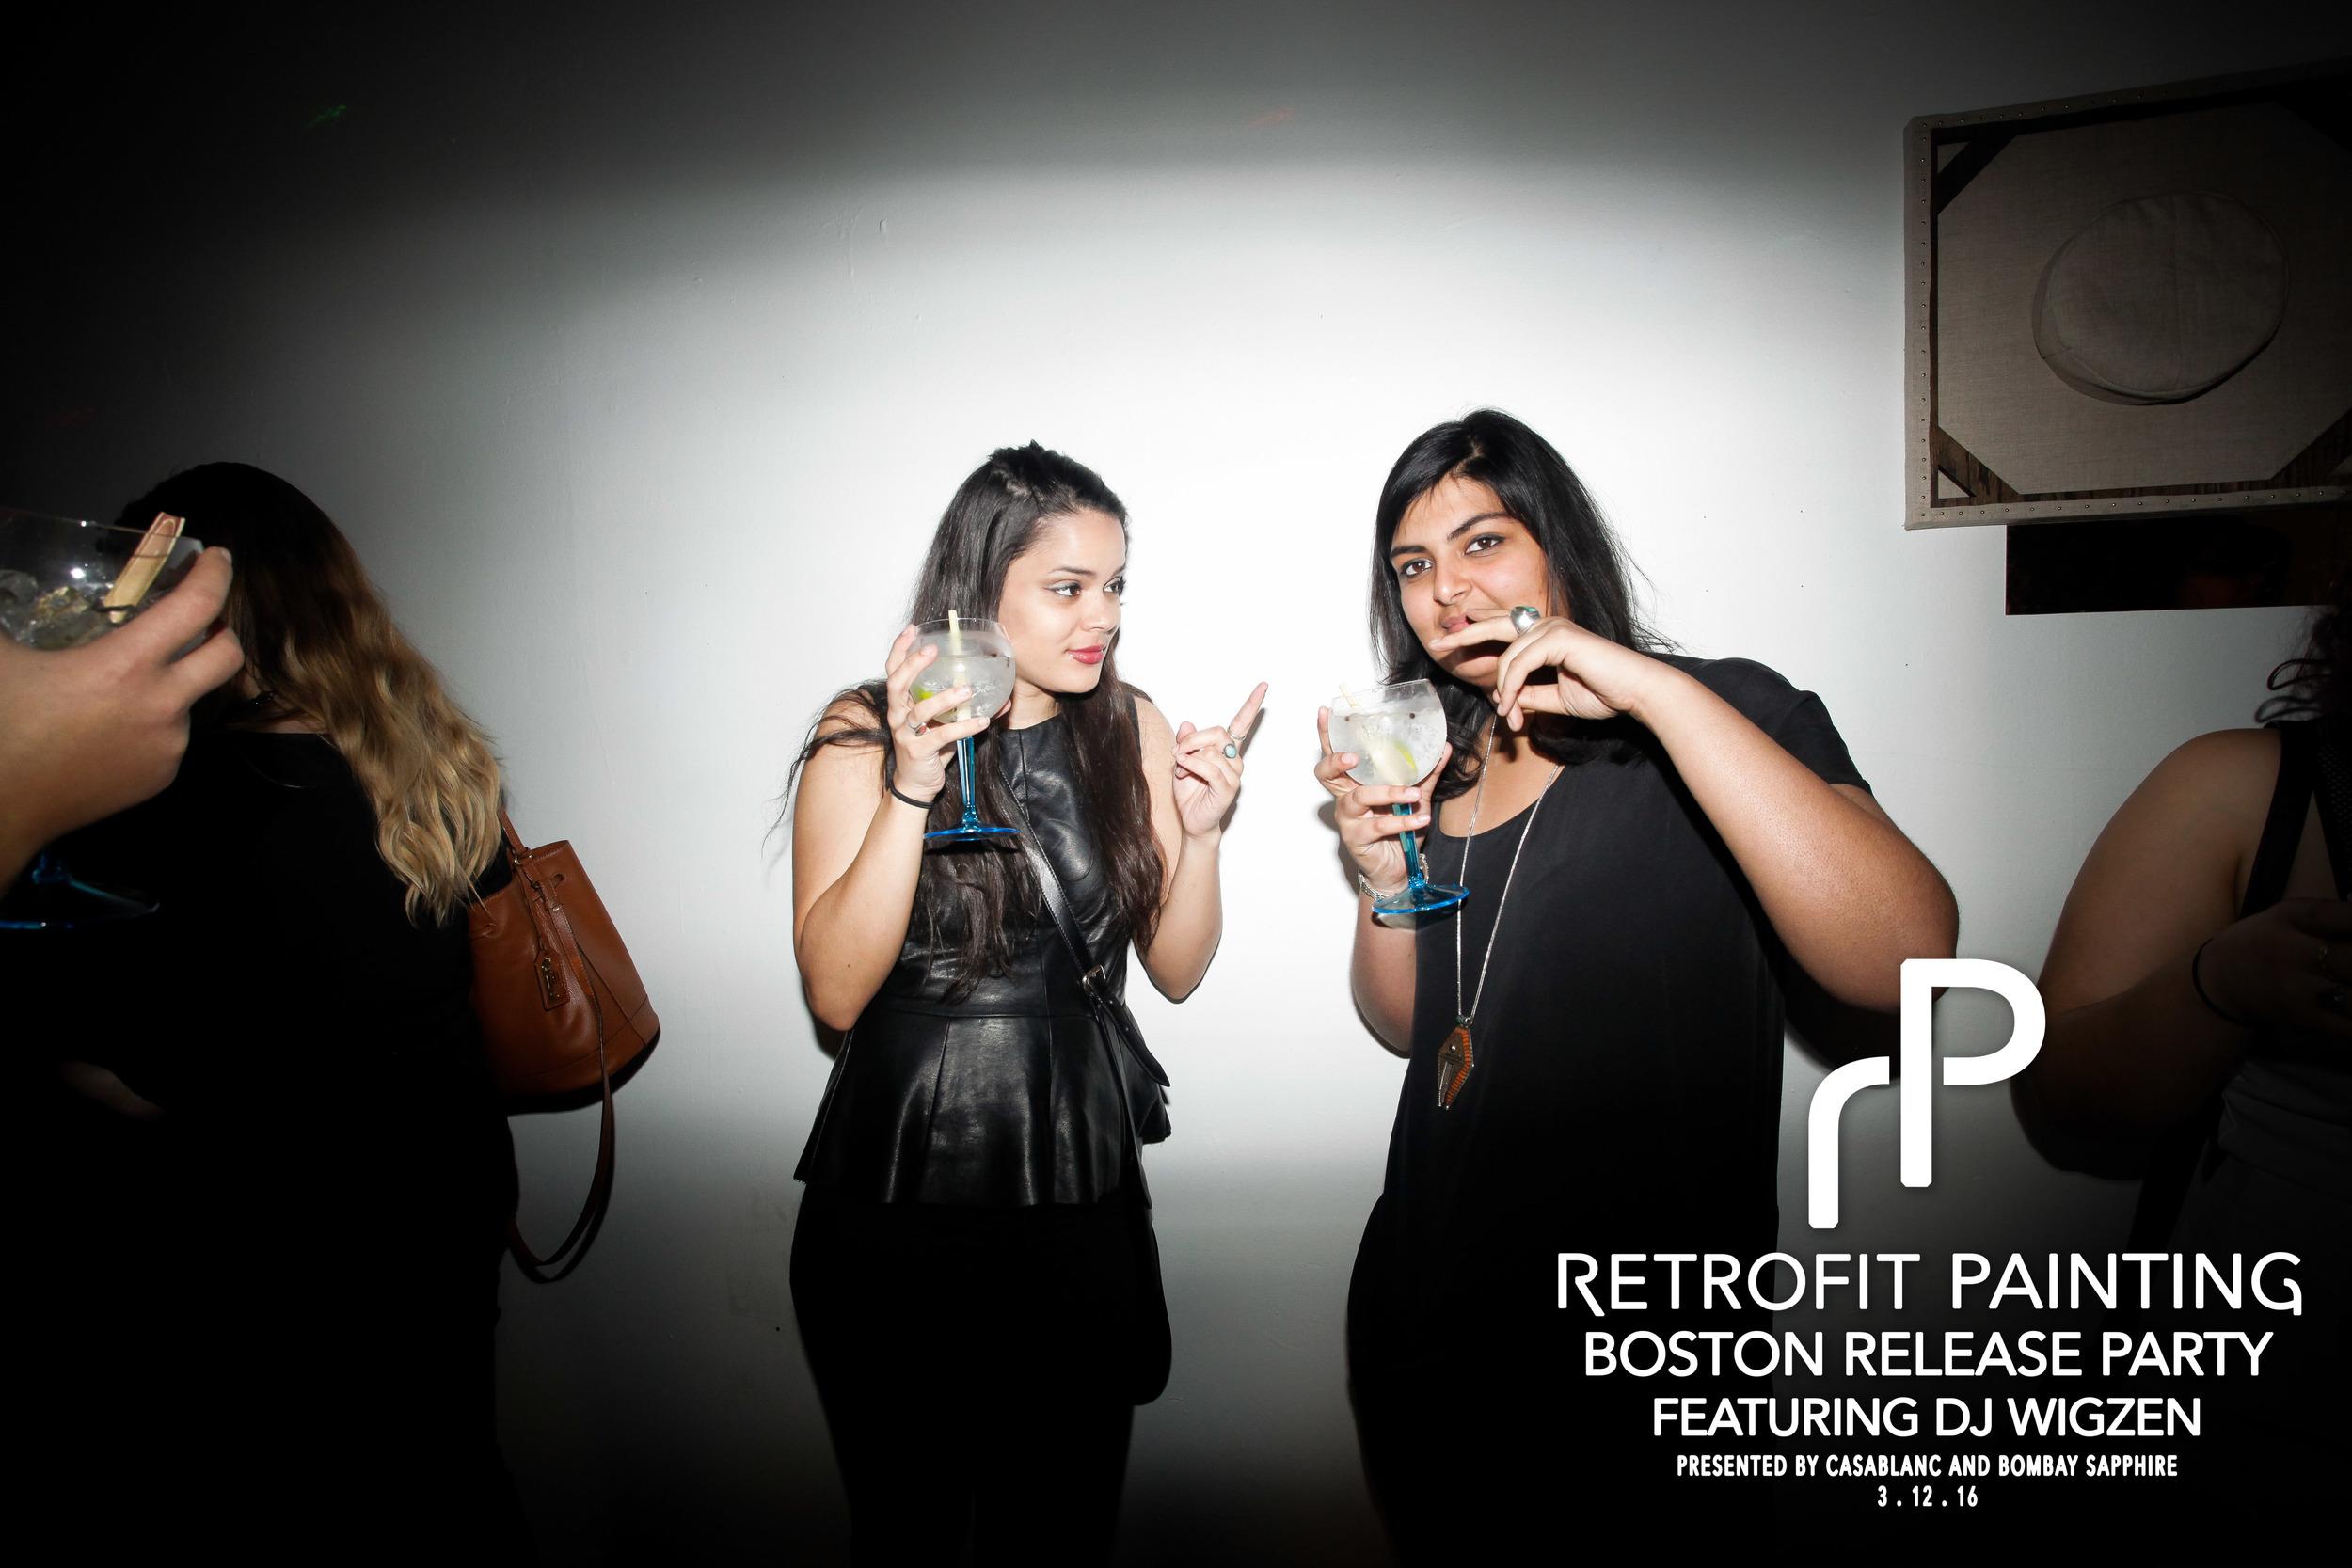 Retrofit Painting Boston Release Party 0105.jpg